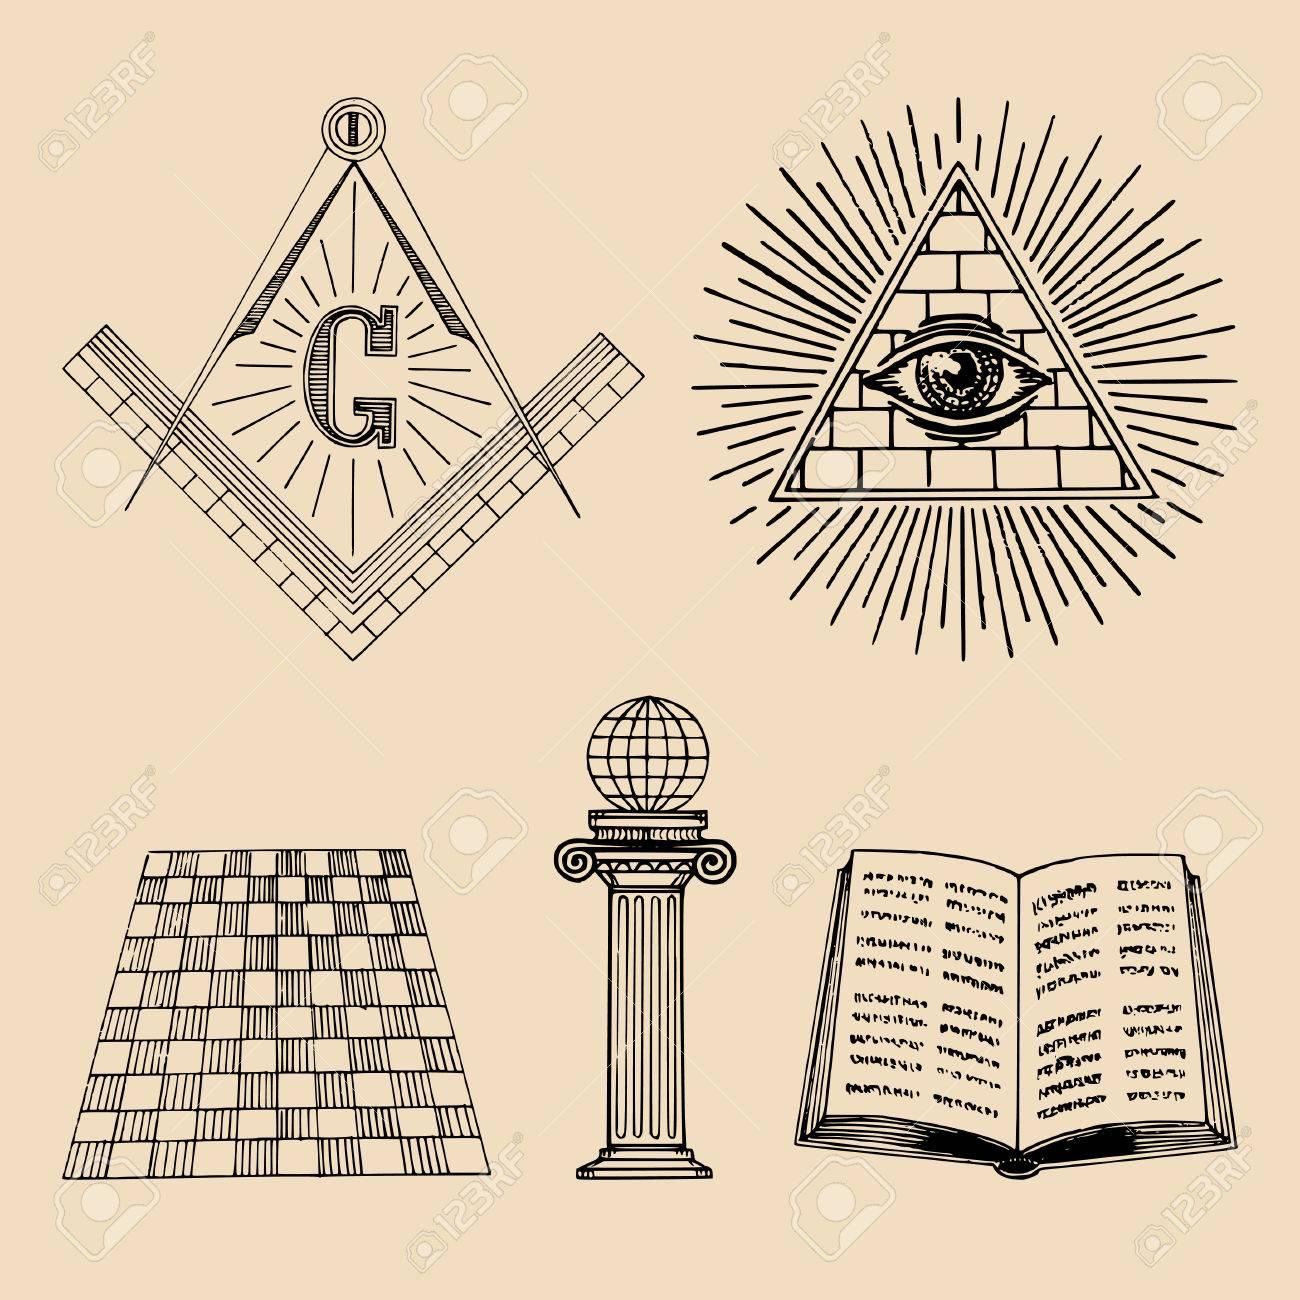 1300x1300 Collection Of Free Freemasonry Clipart Masonic Symbol. Download On